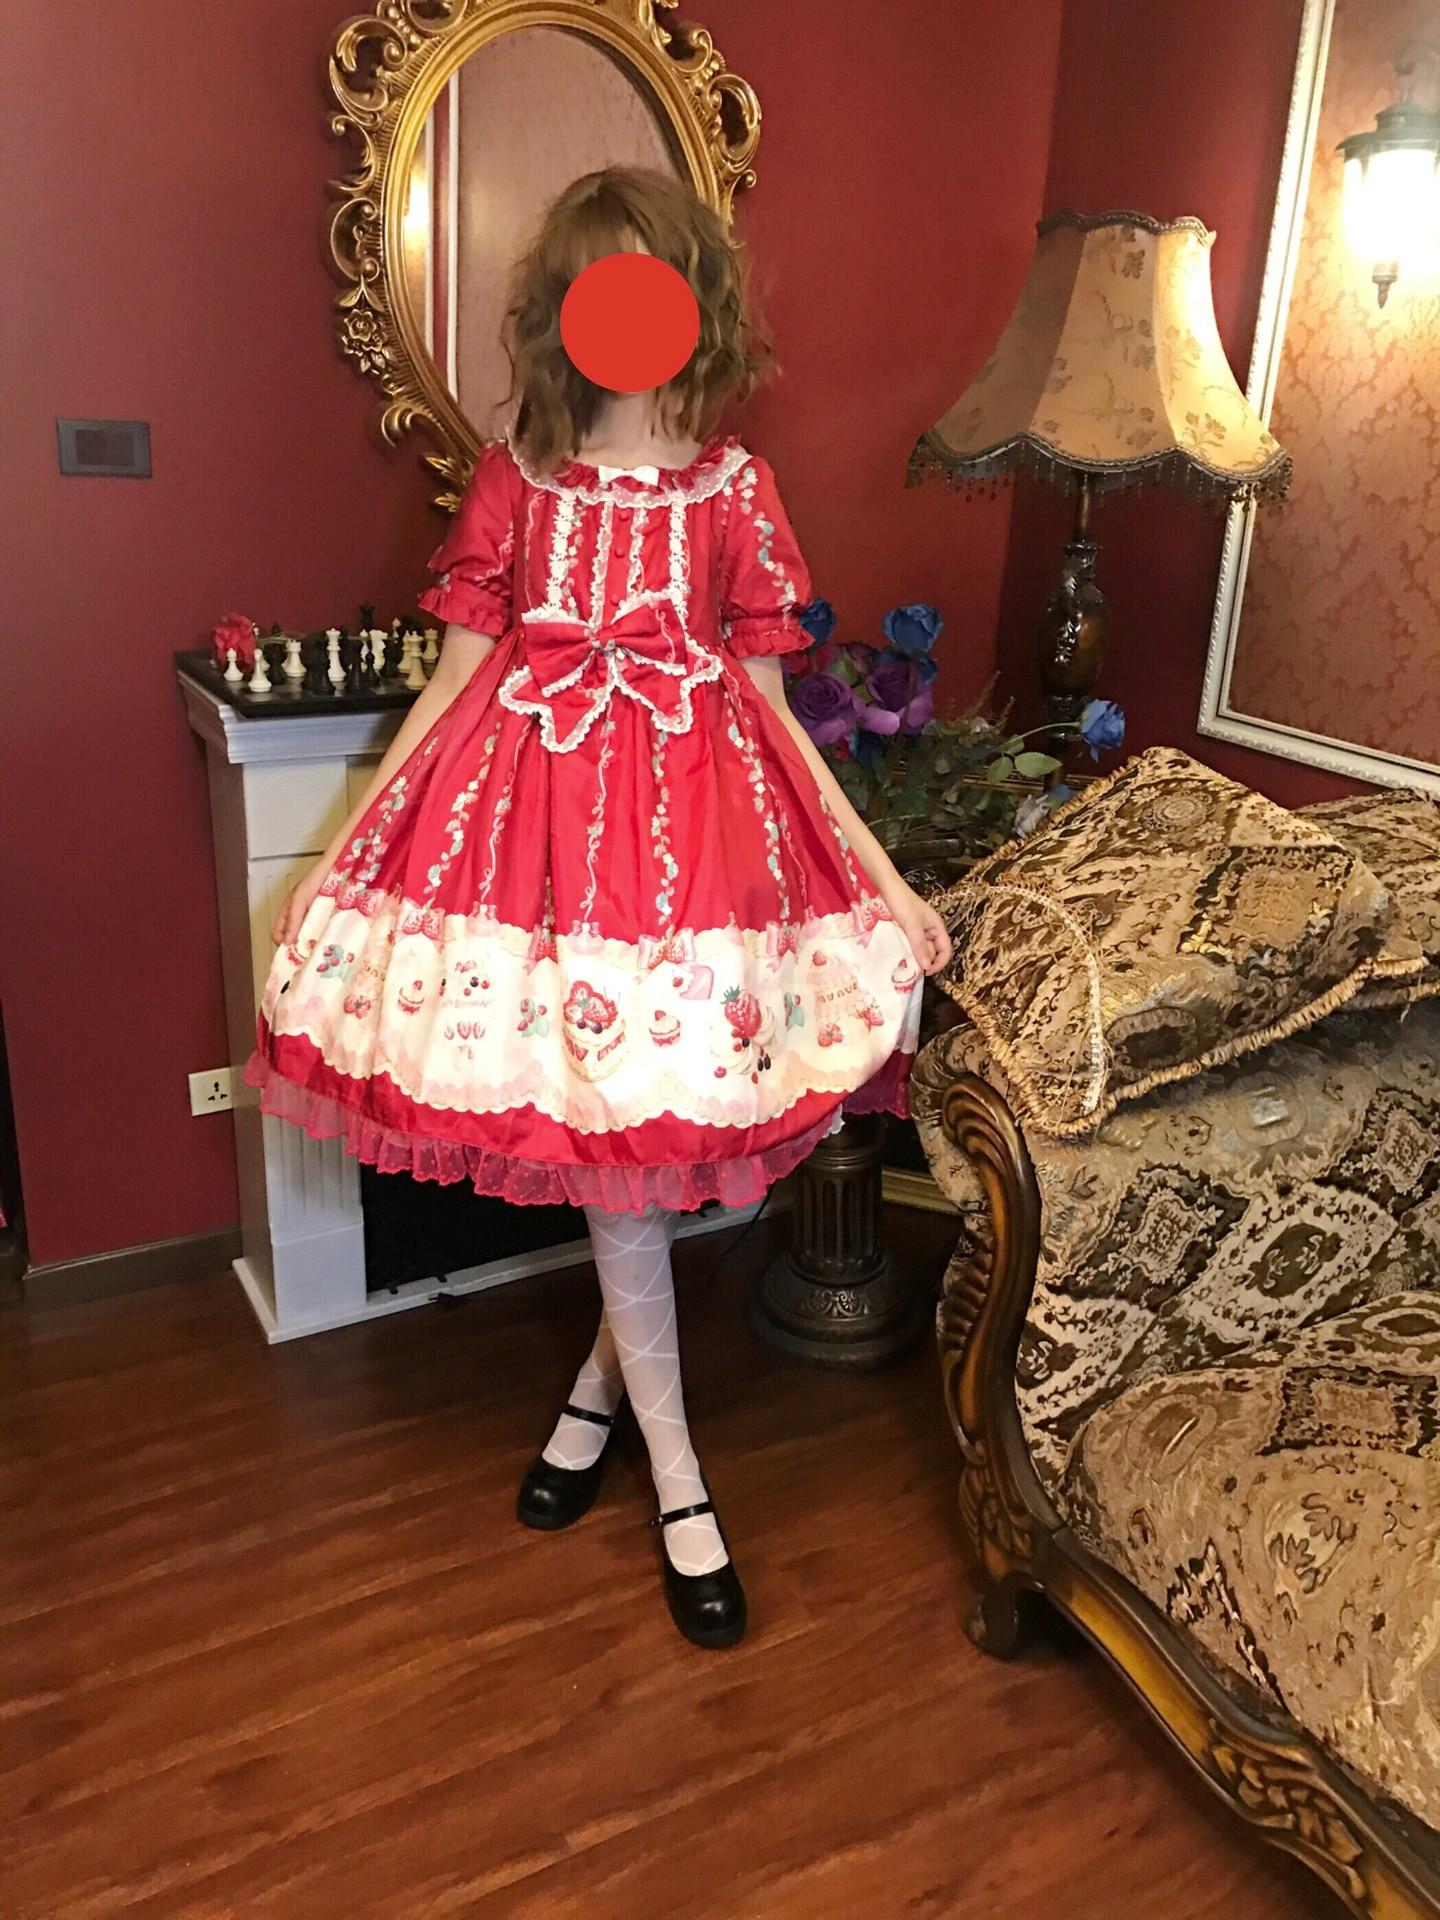 2019 harajuku street cross cosplay femme robe lolita japonaise robe gothique lolita fée kei lolita kawaii lolita vêtements